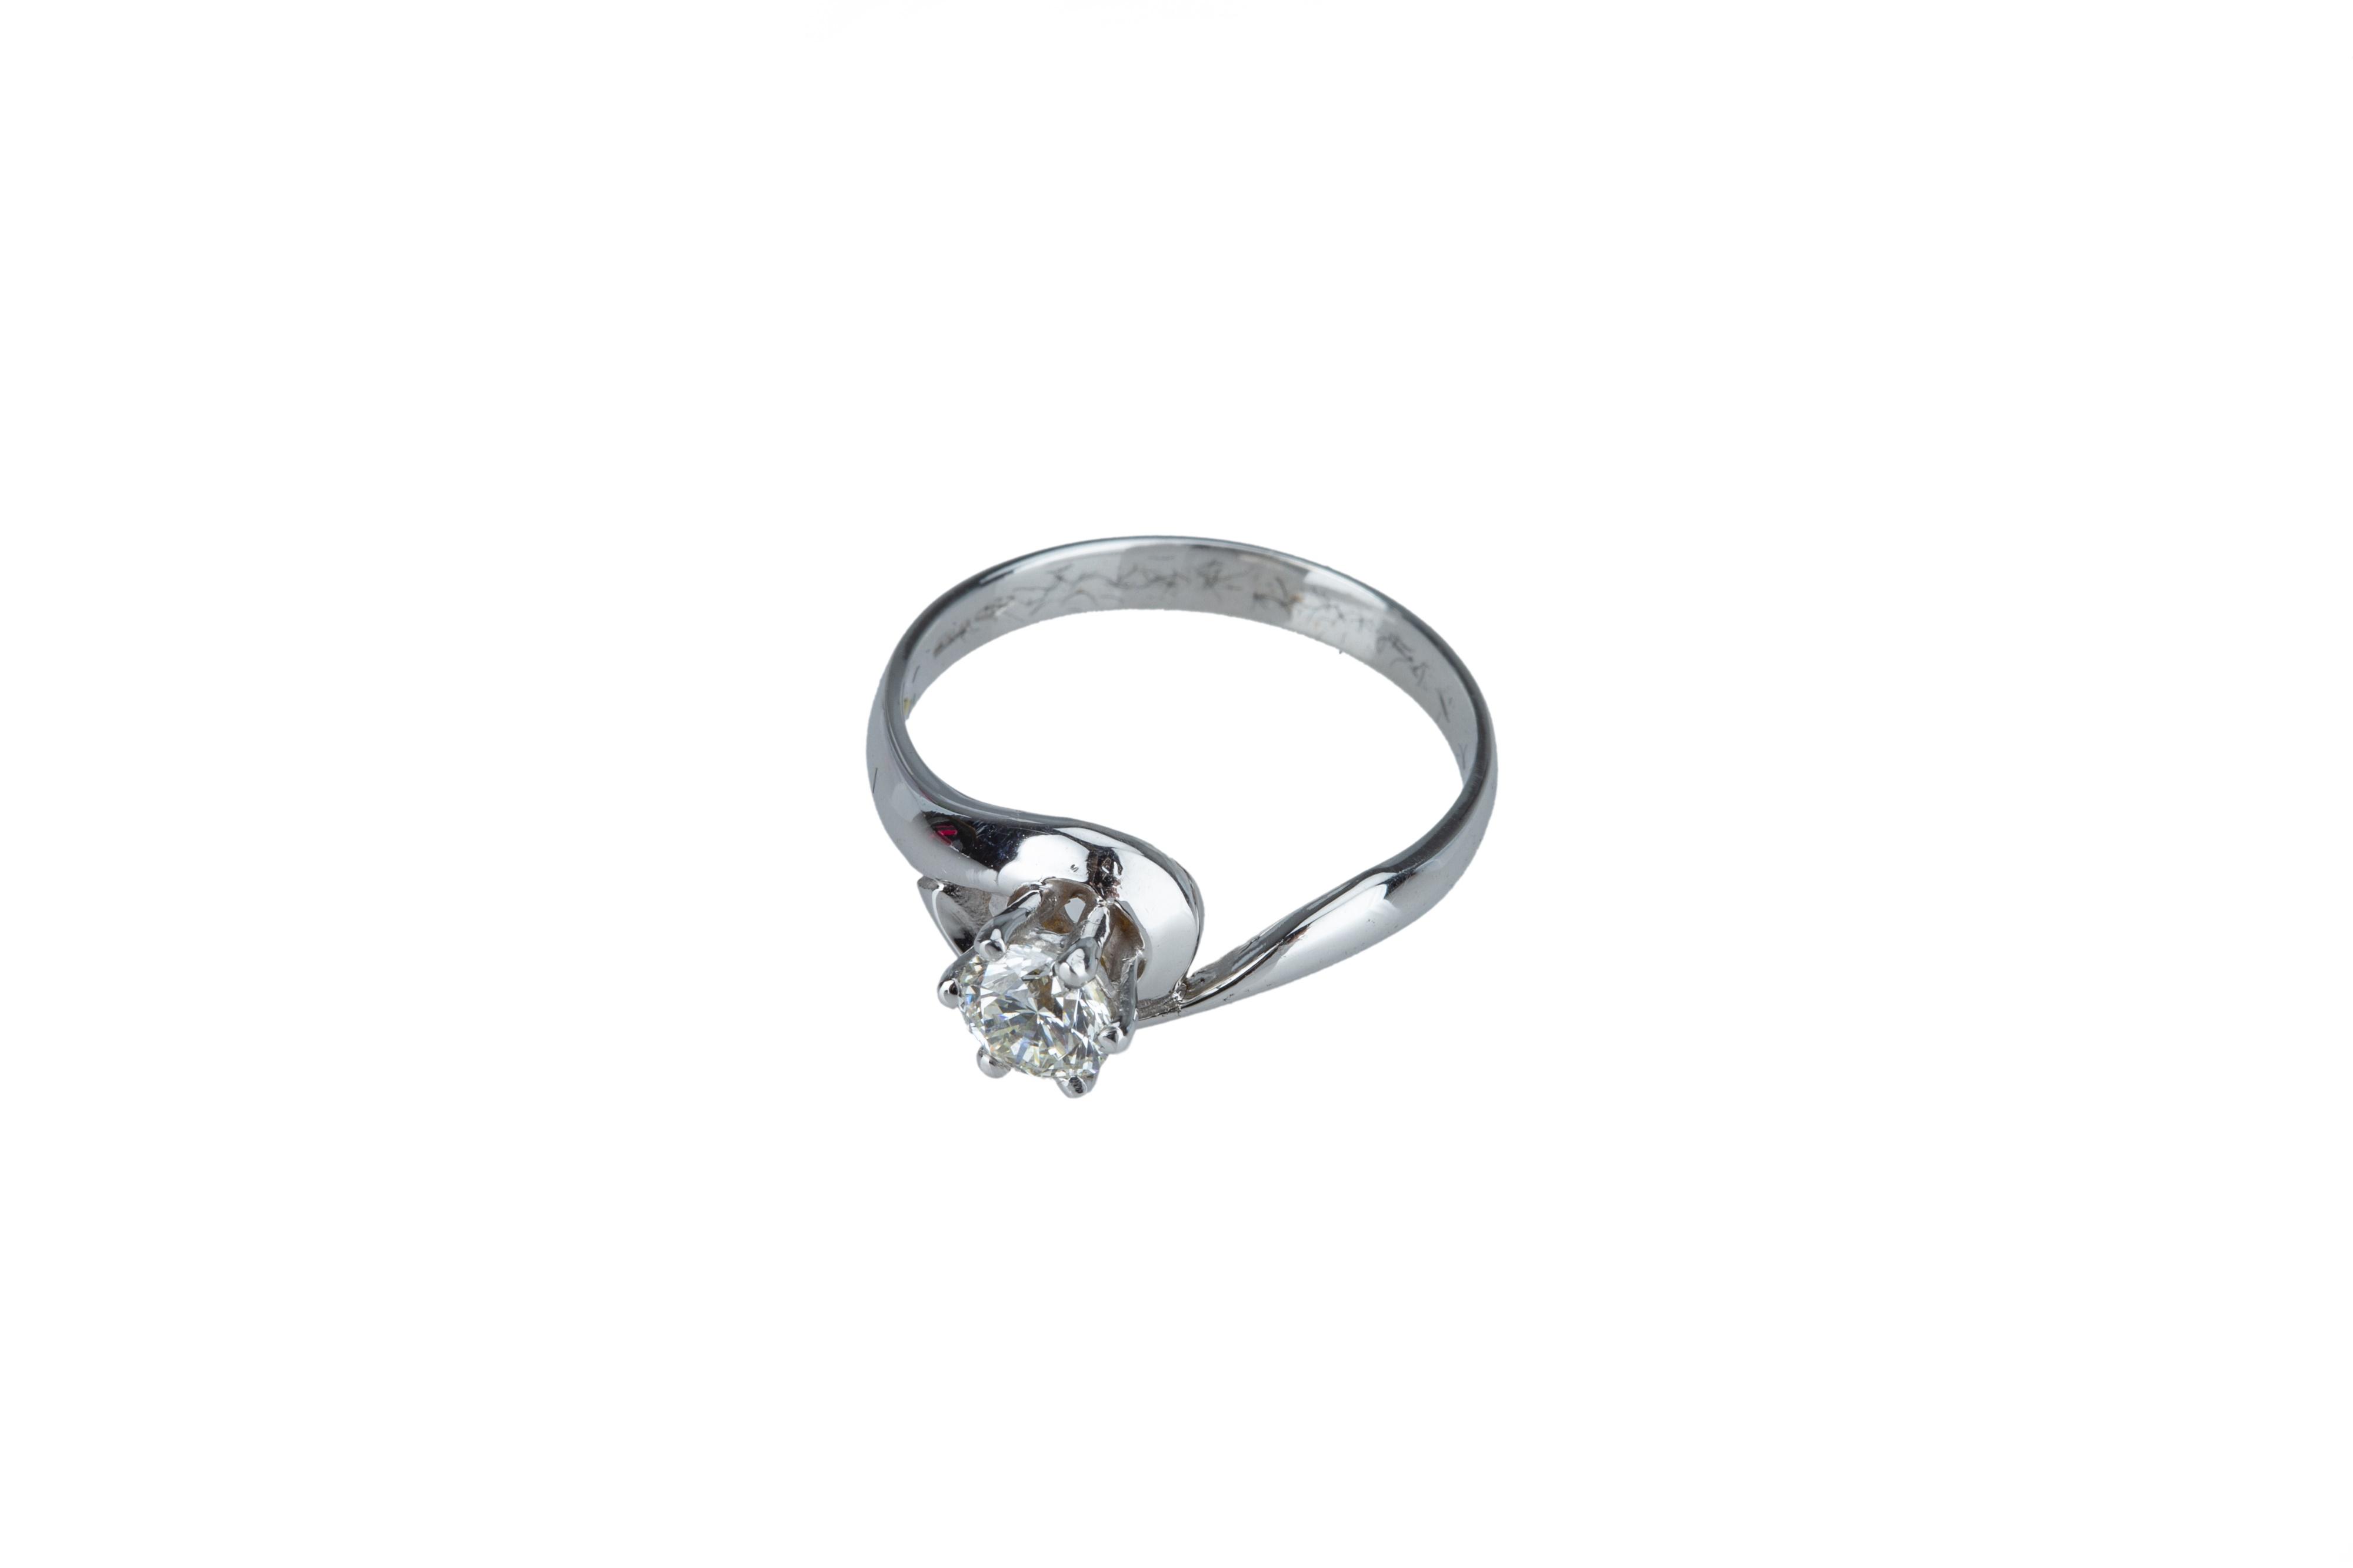 A single stone diamond ring. - Image 2 of 3